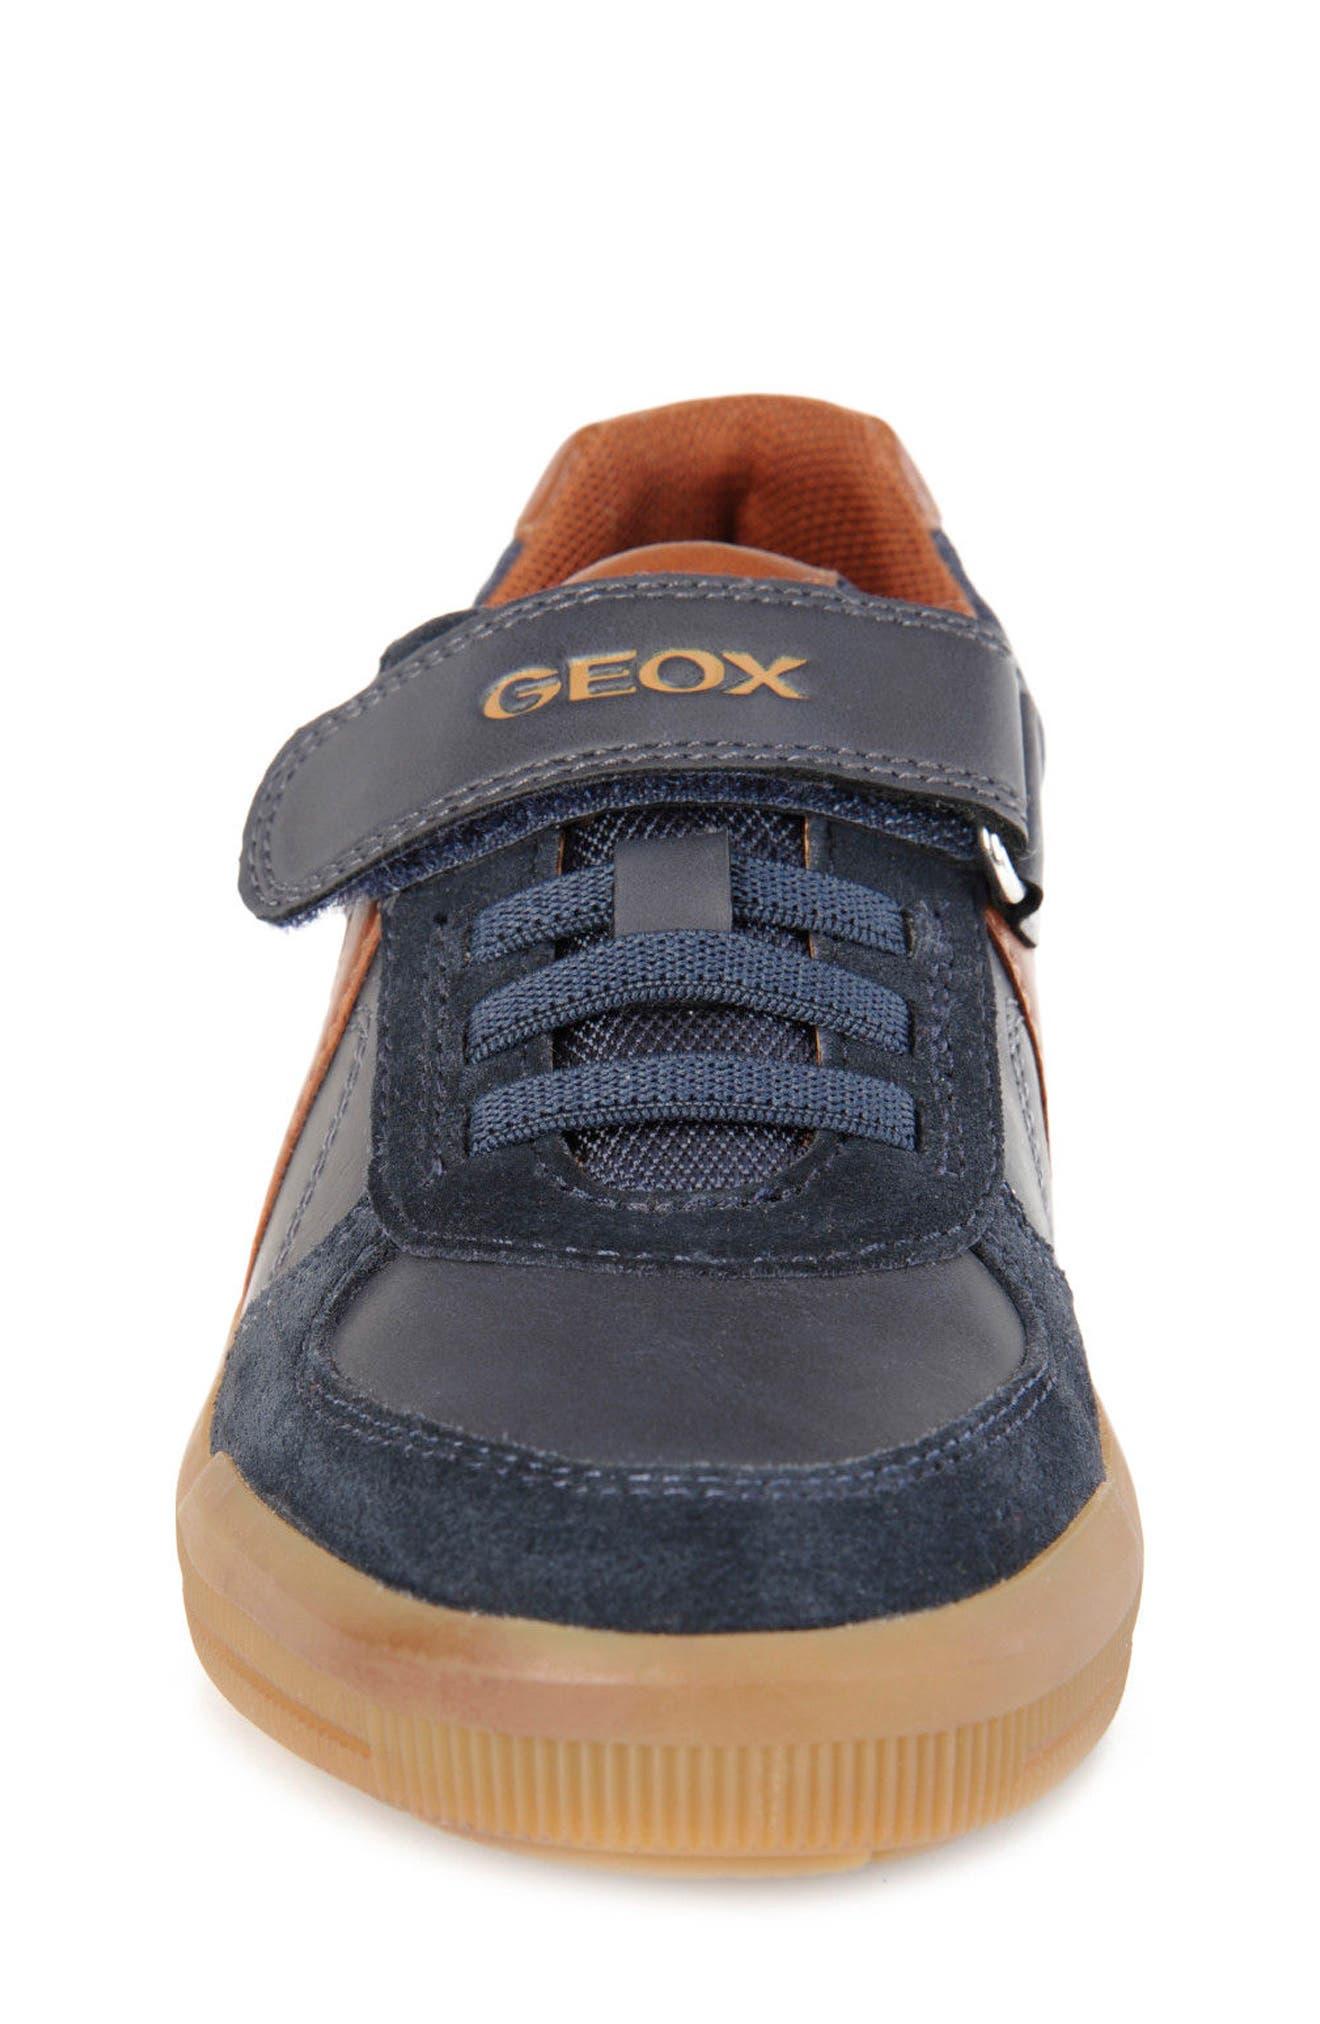 Alternate Image 4  - Geox Arzach Low Top Sneaker (Toddler, Little Kid & Big Kid)